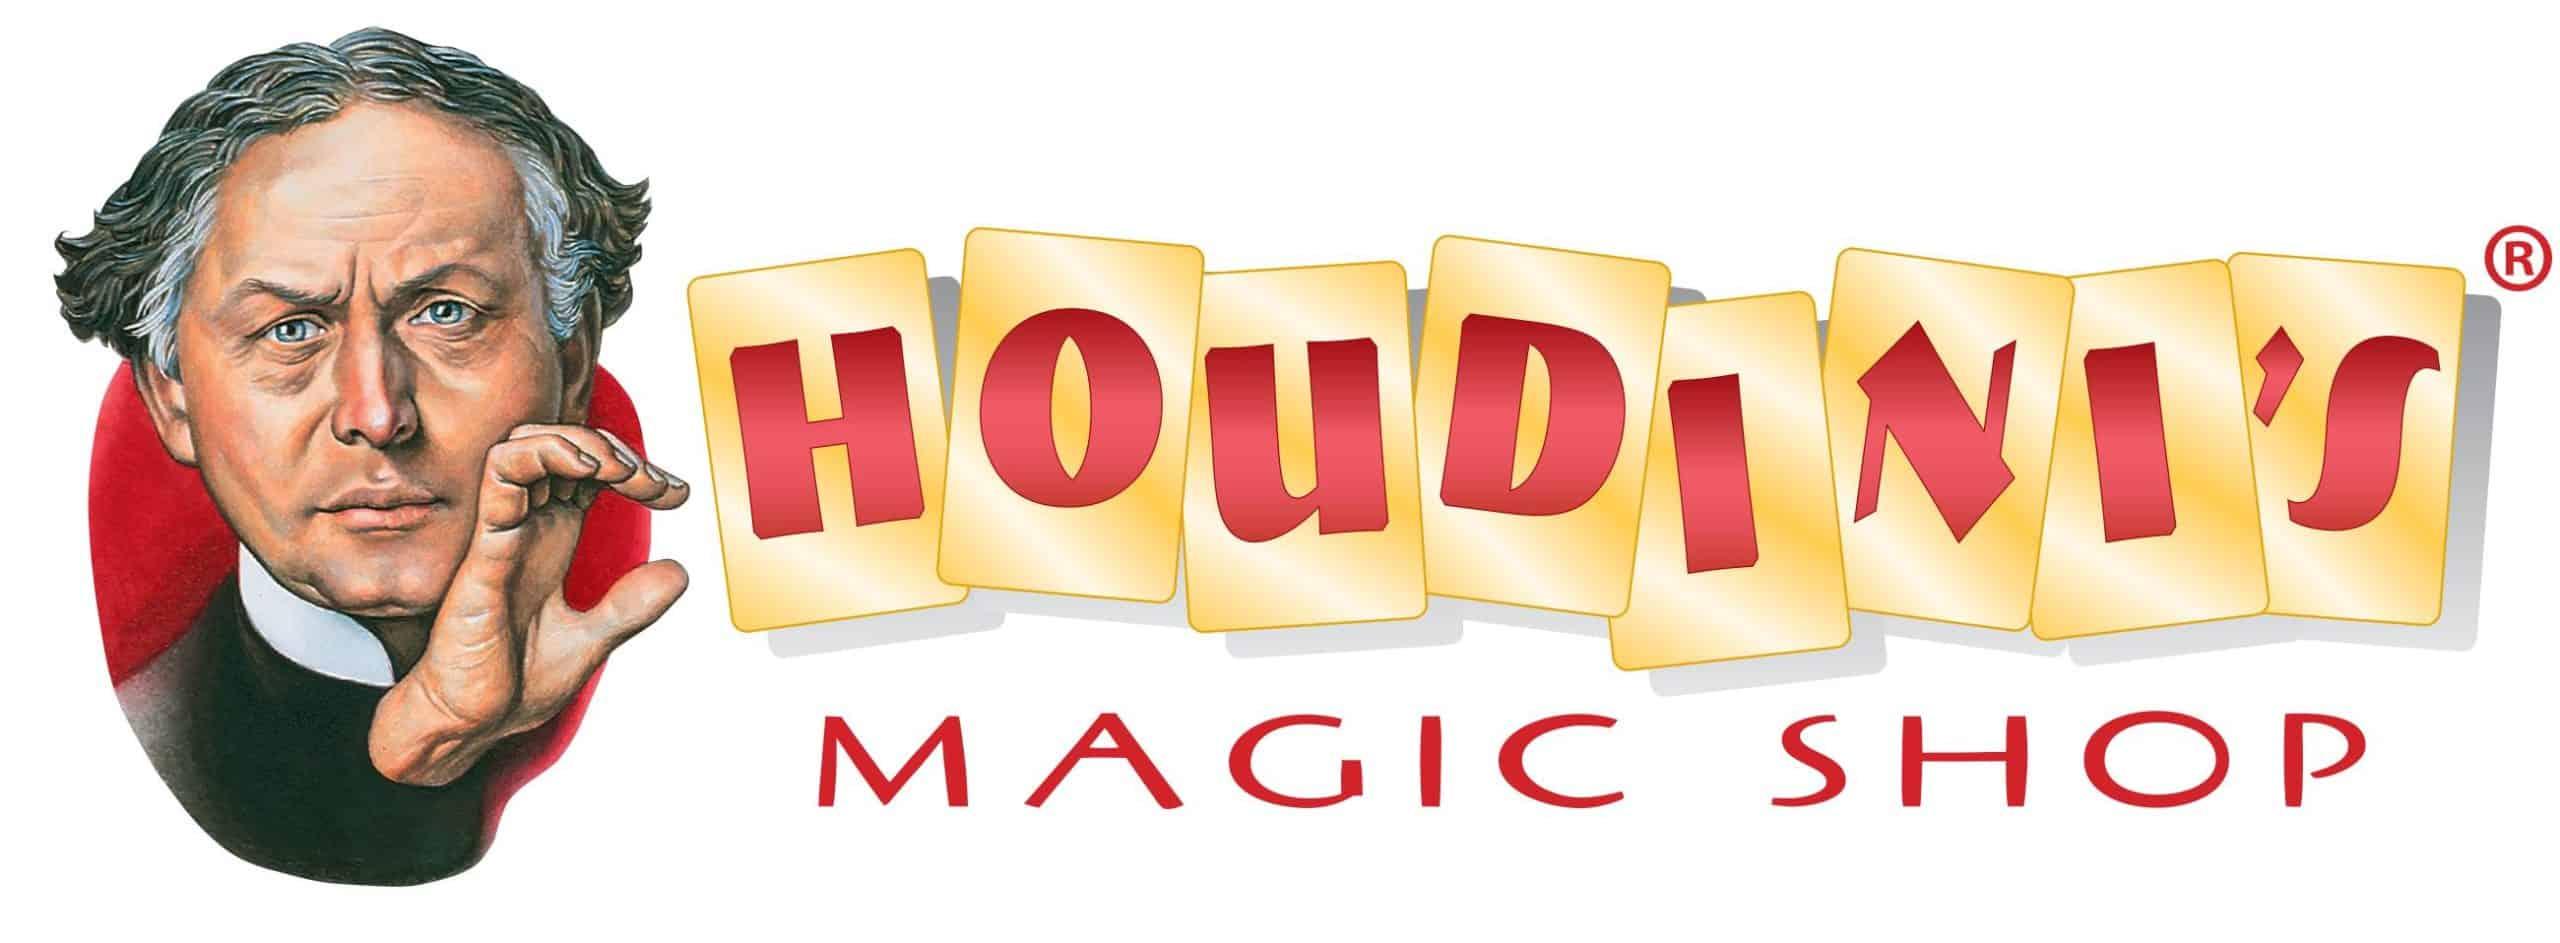 Houdini's Magic Shop